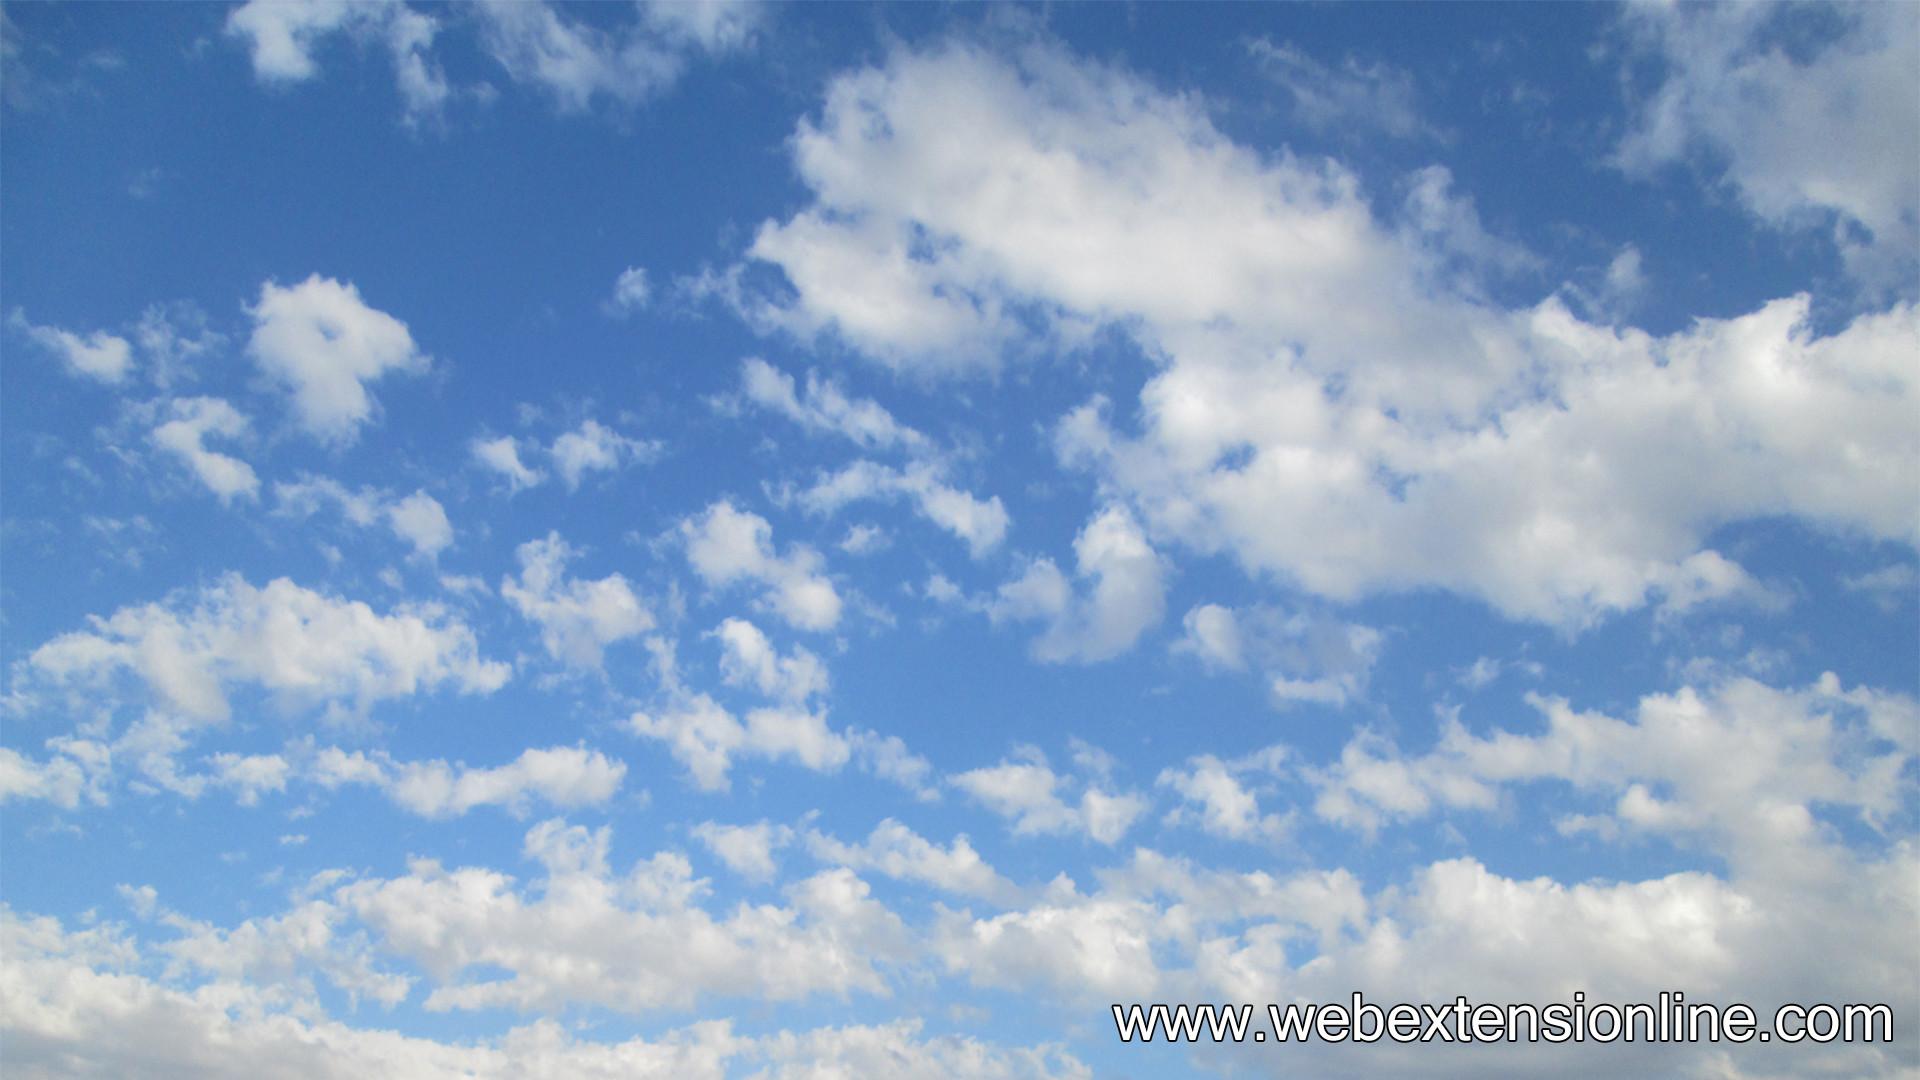 HD Blue Sky White Clouds Wallpaper